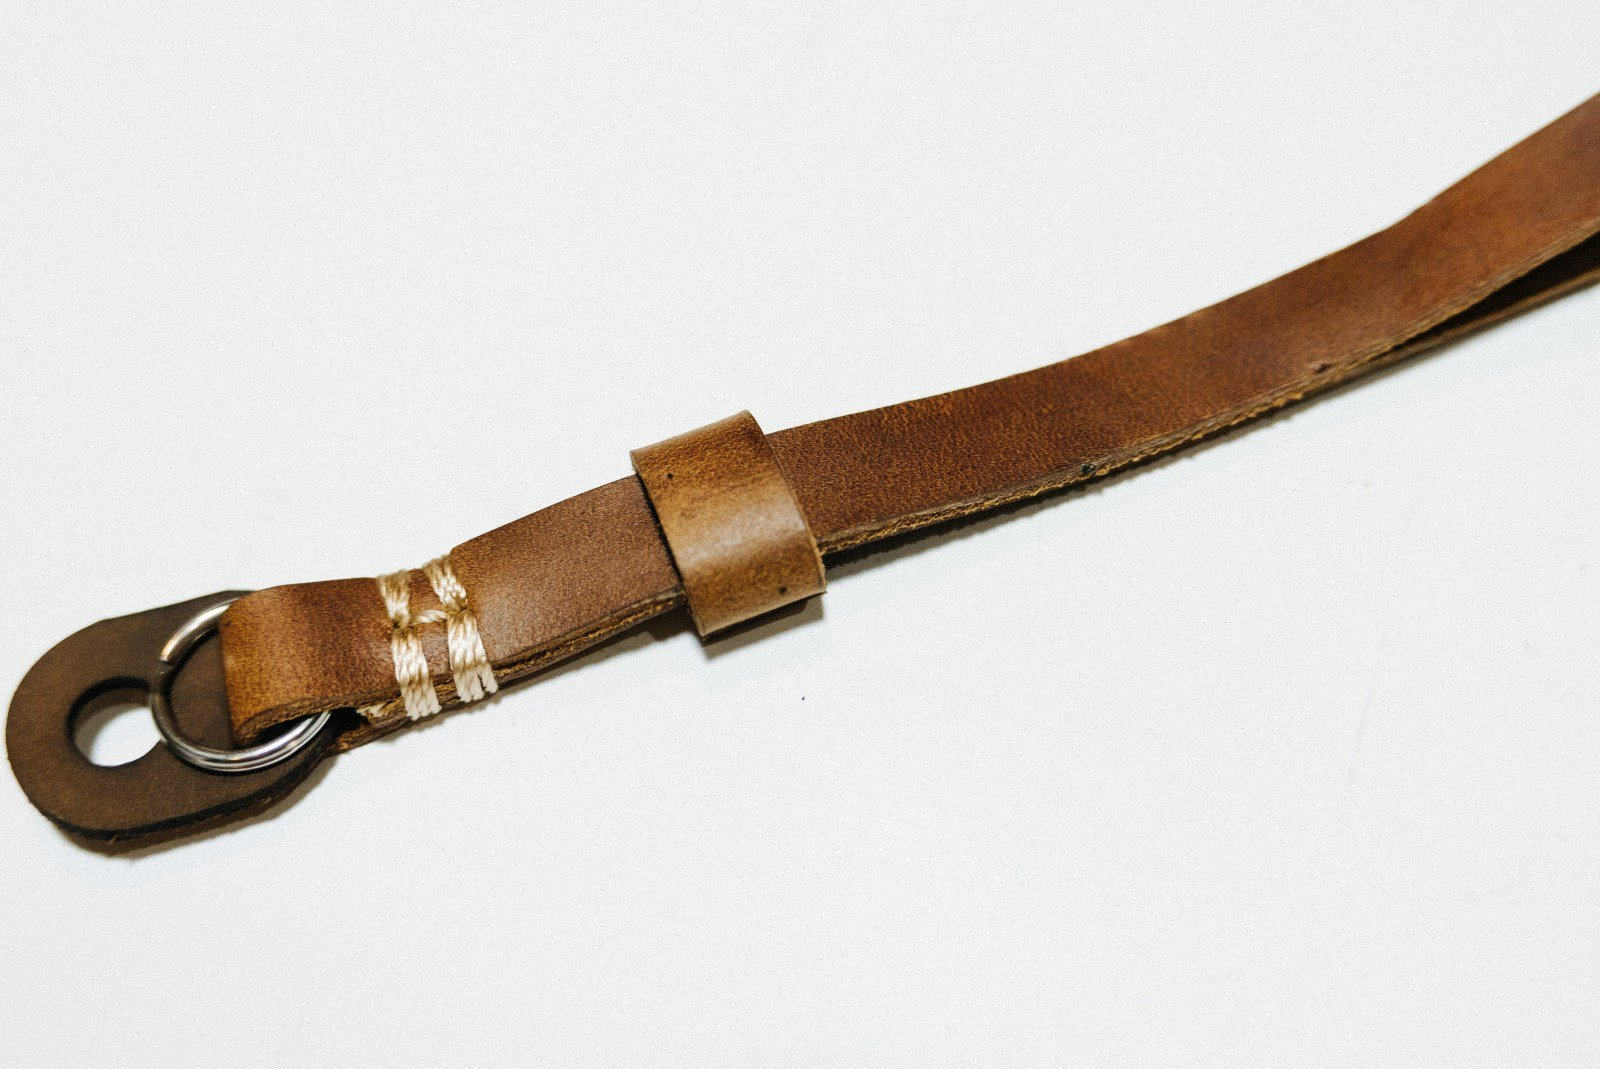 Henri by Eric Kim Handmade Premium Leather Camera Wrist Strap